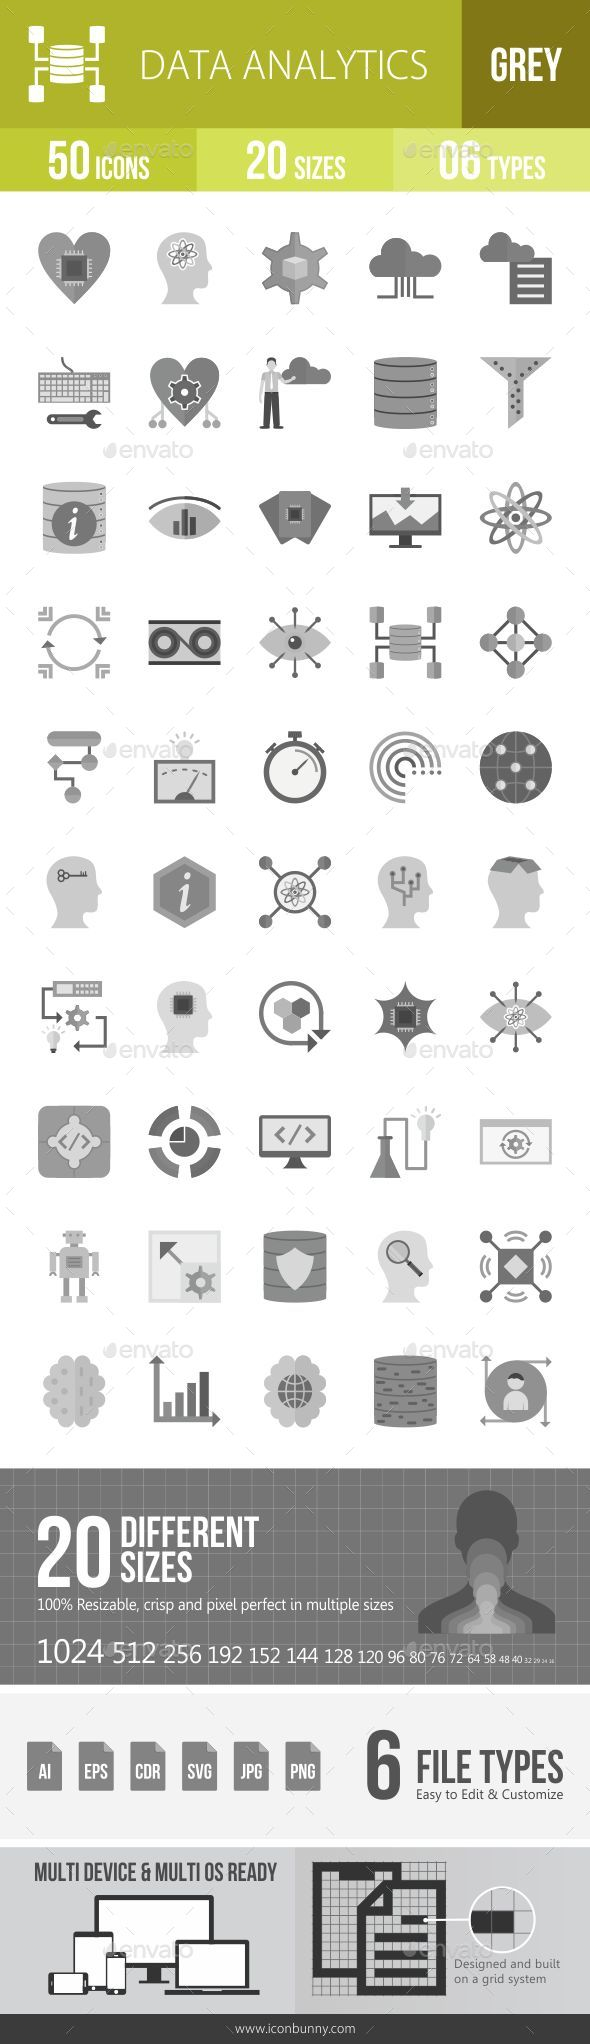 Data Analytics Greyscale Icons - Icons